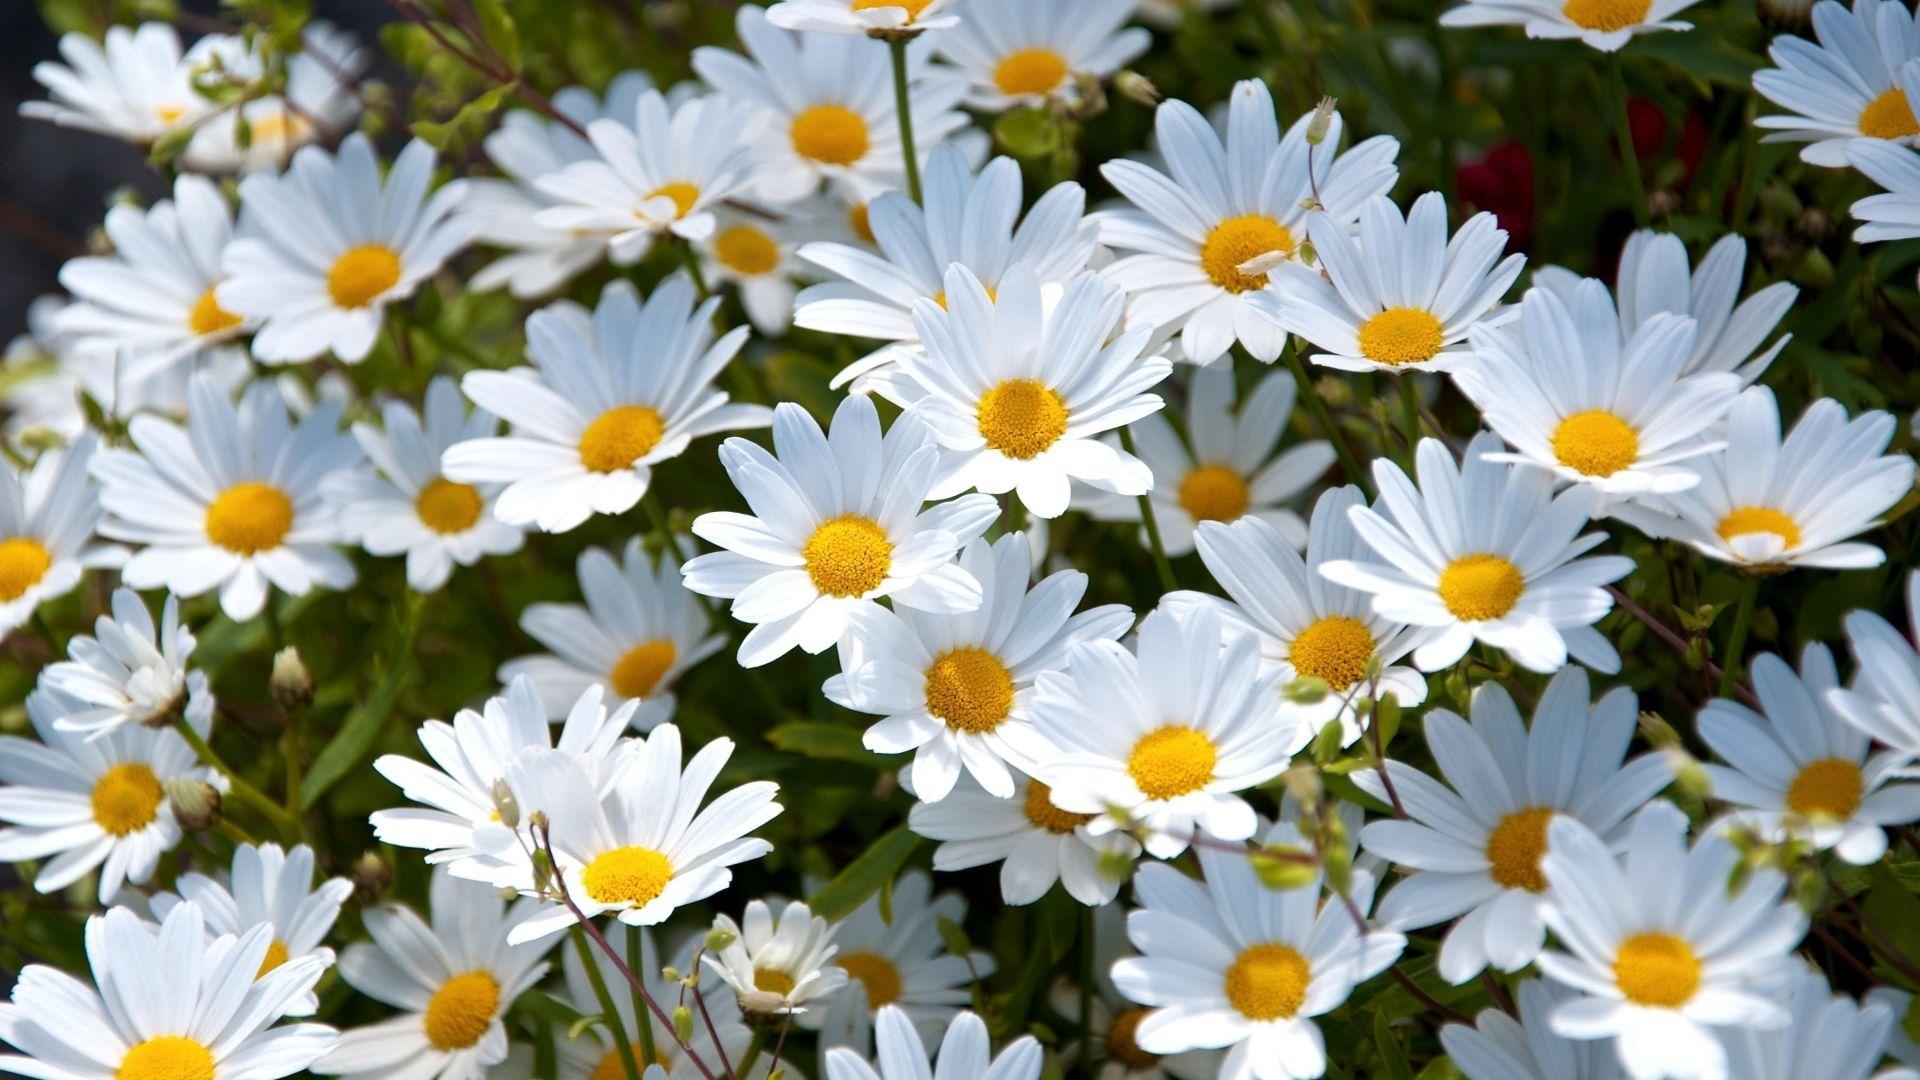 1920x1080 wallpaper daisies white meadow summer mood autumn 1920x1080 wallpaper daisies white meadow summer mood mightylinksfo